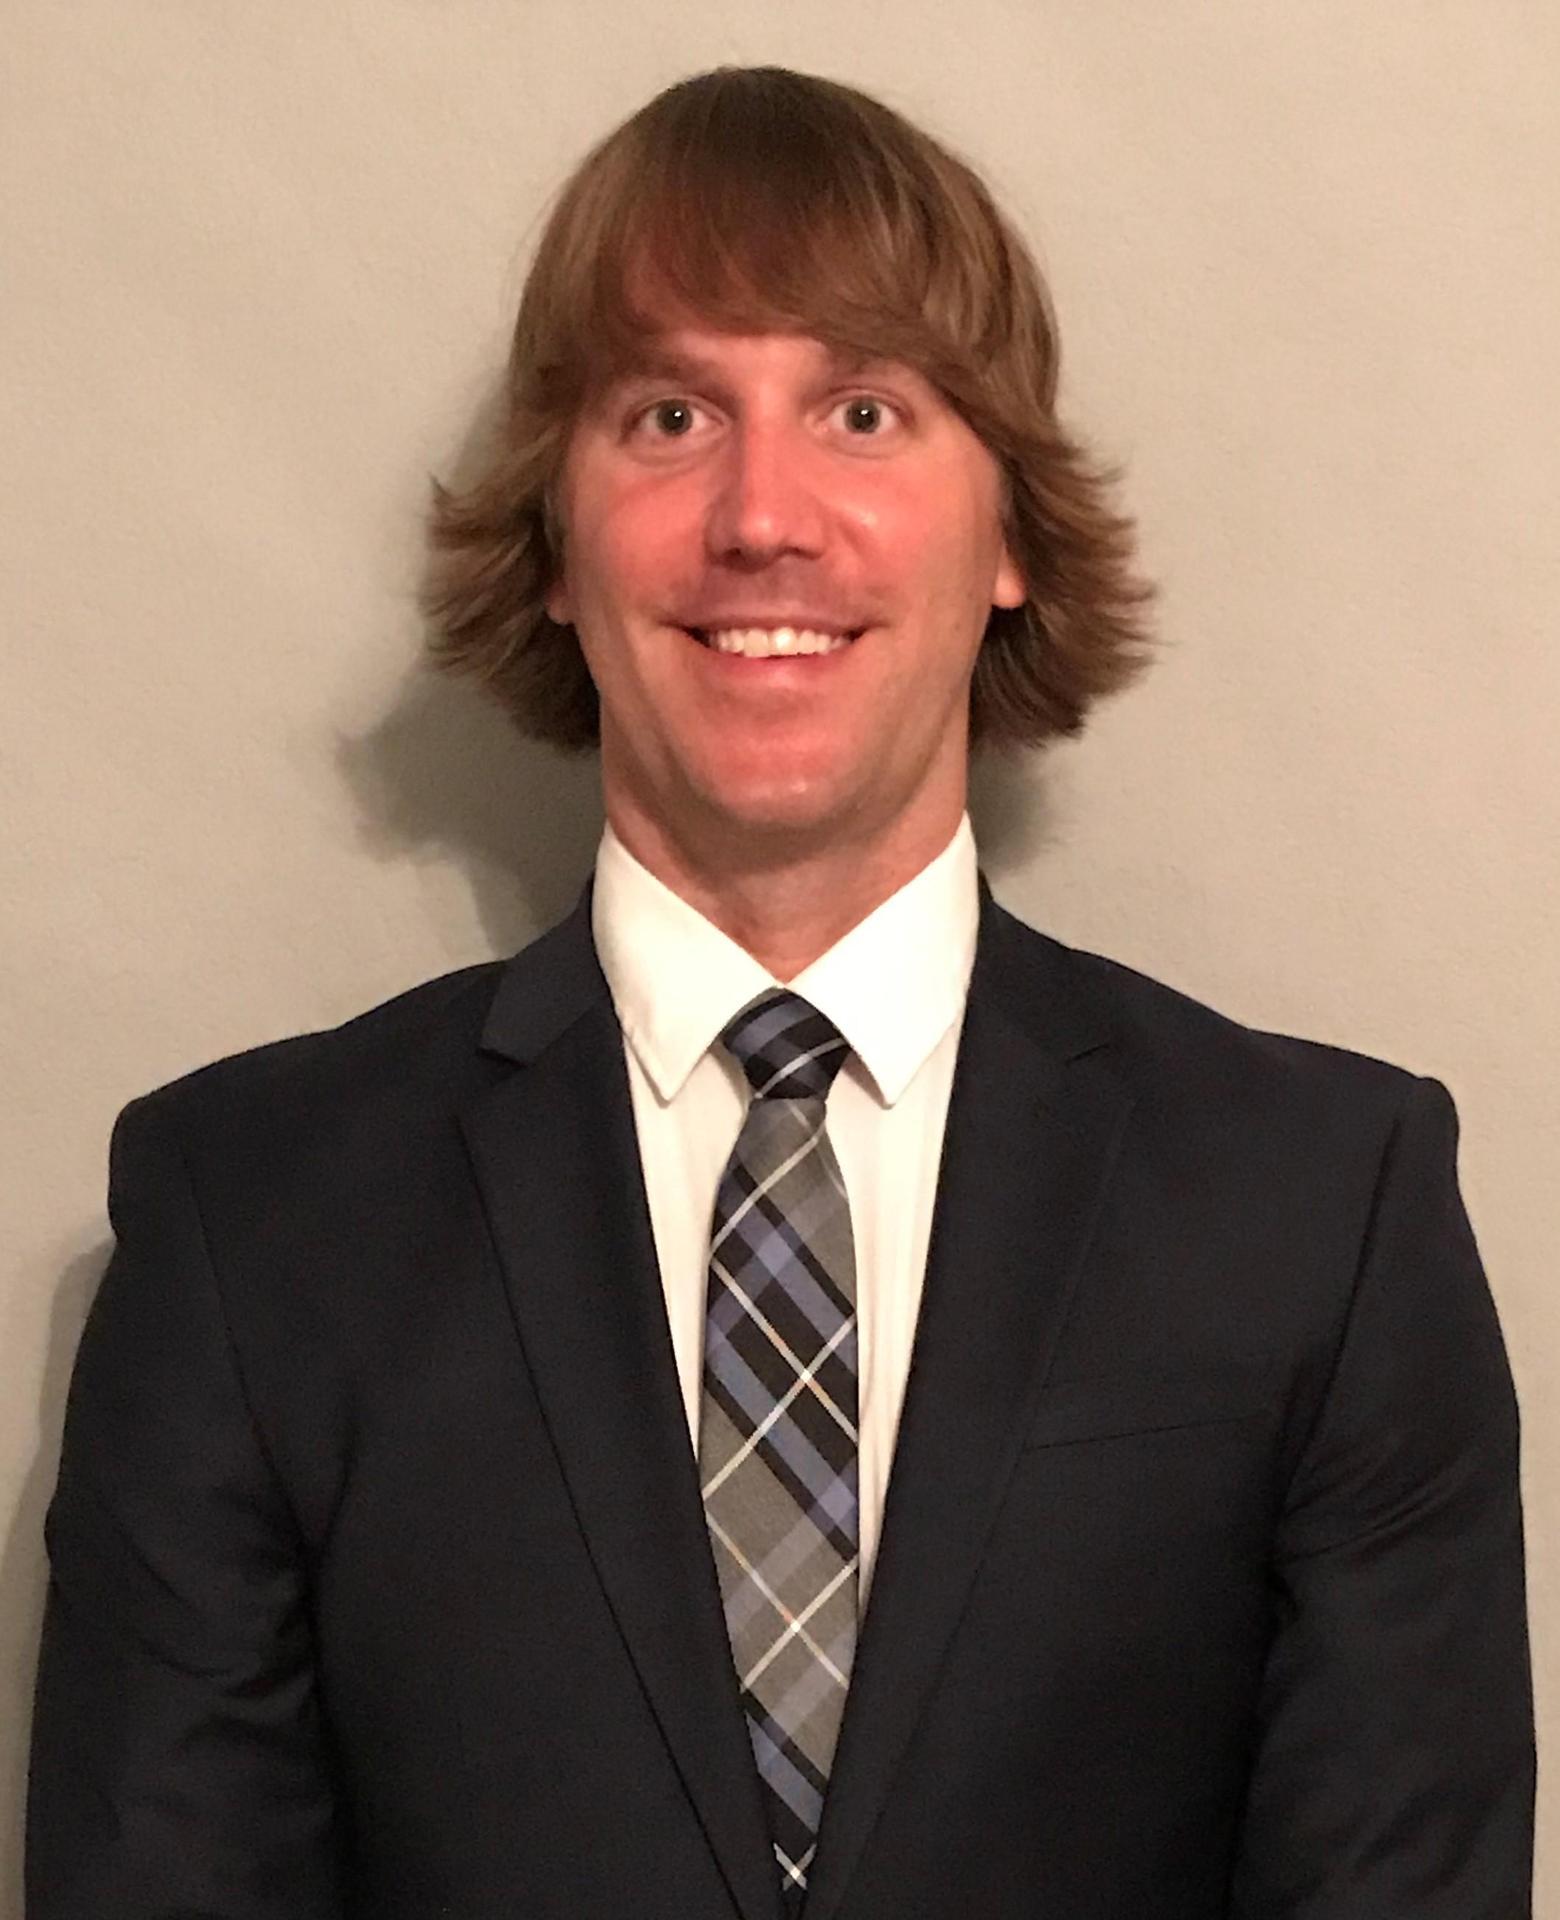 Chris Penny, Assistant Principal